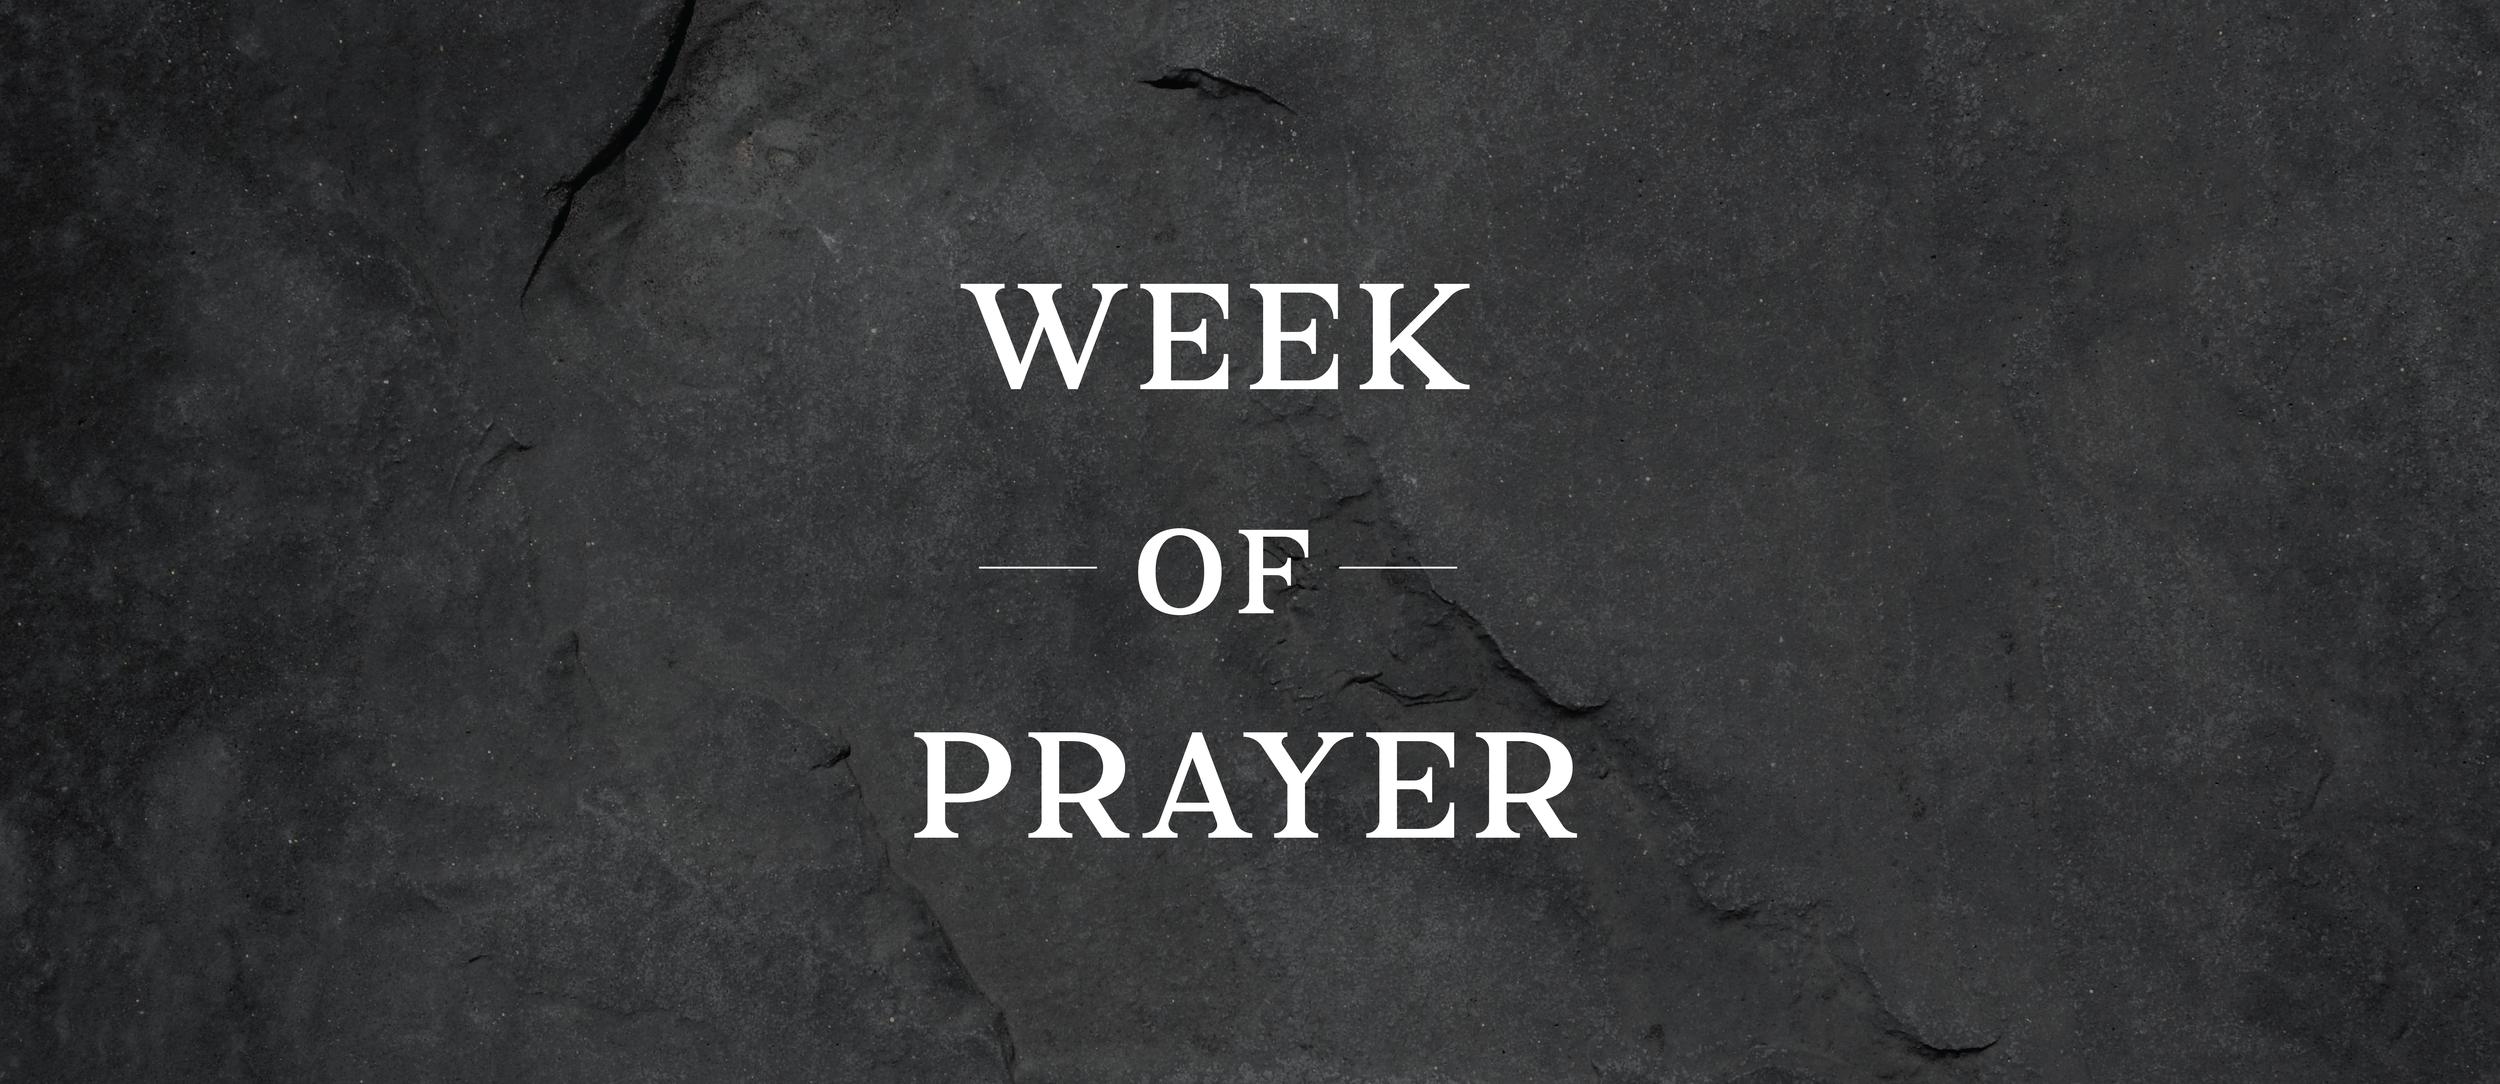 prayer week-01.png